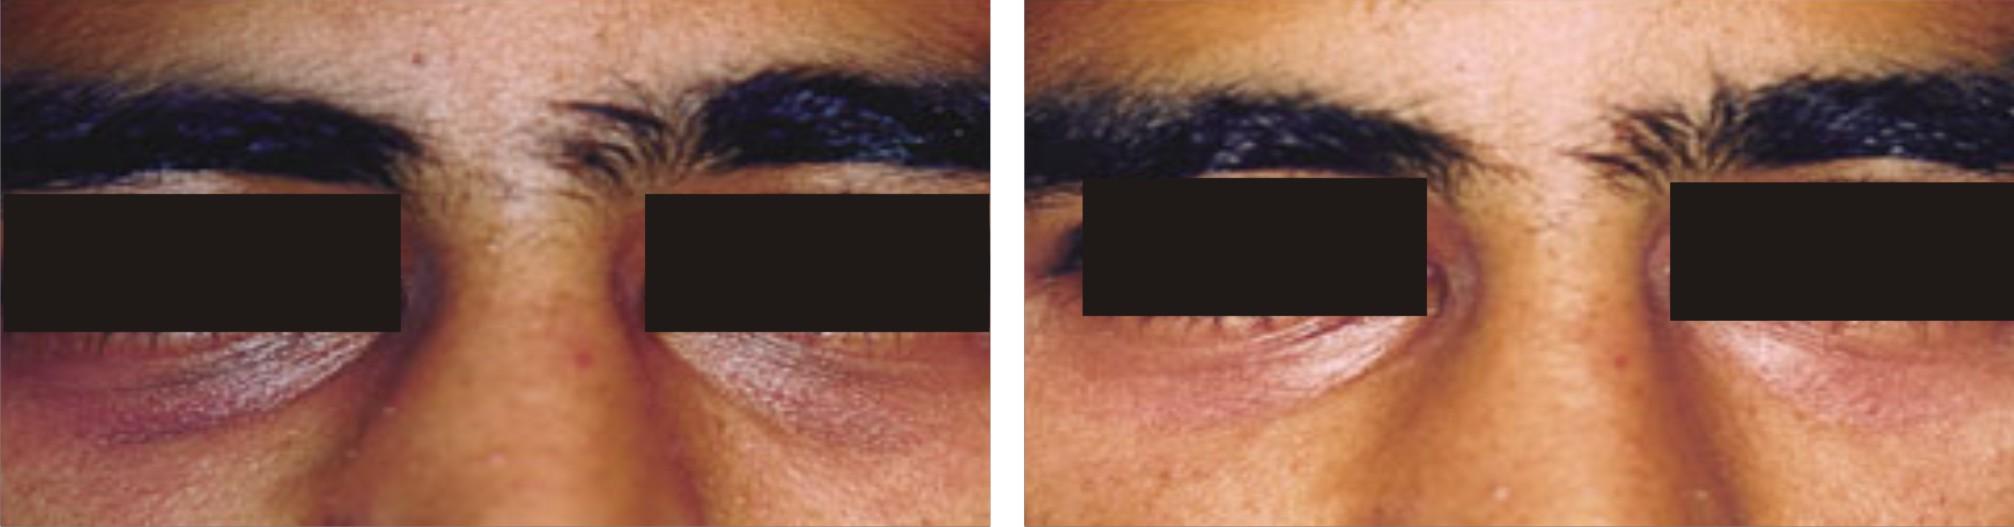 Under Eye Dark Circles | Under Eye Dark Circles Removal ...